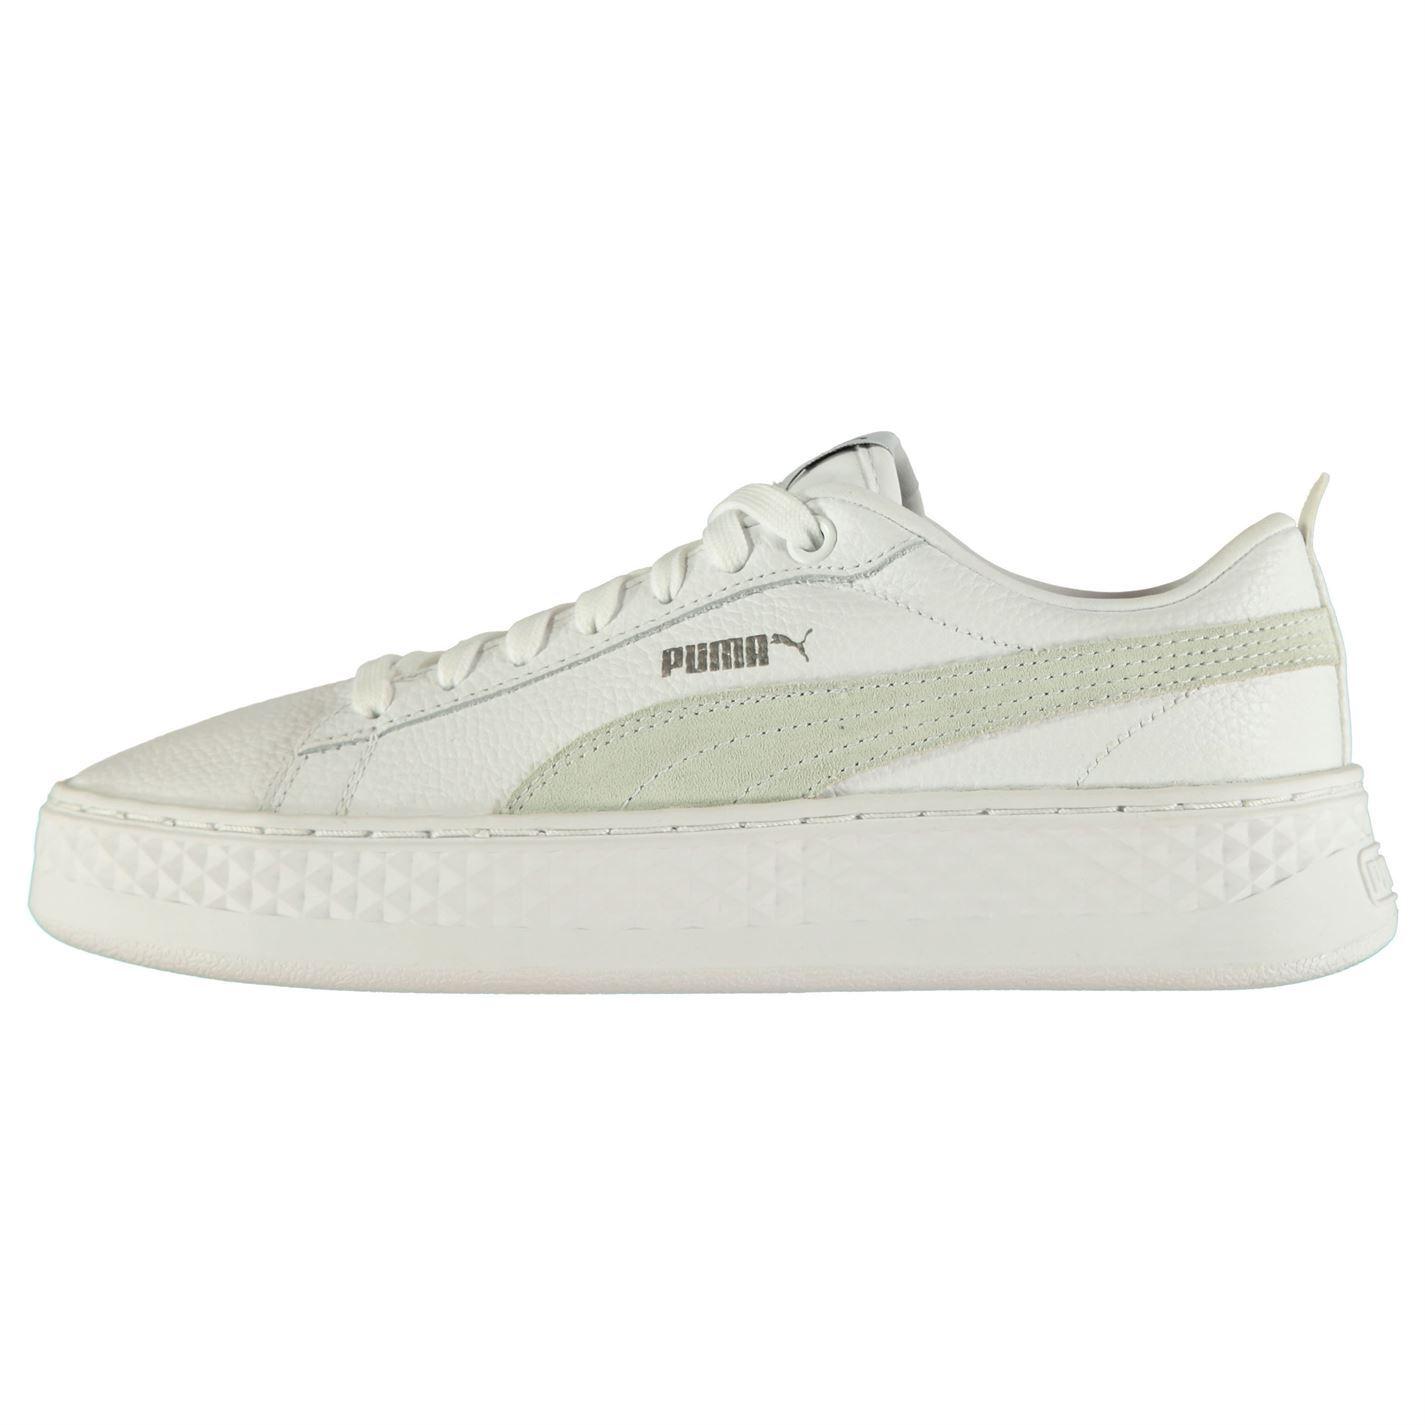 Puma Puma Puma Smash Platform Trainers Womens Athleisure Sneakers shoes Footwear 2caa1b